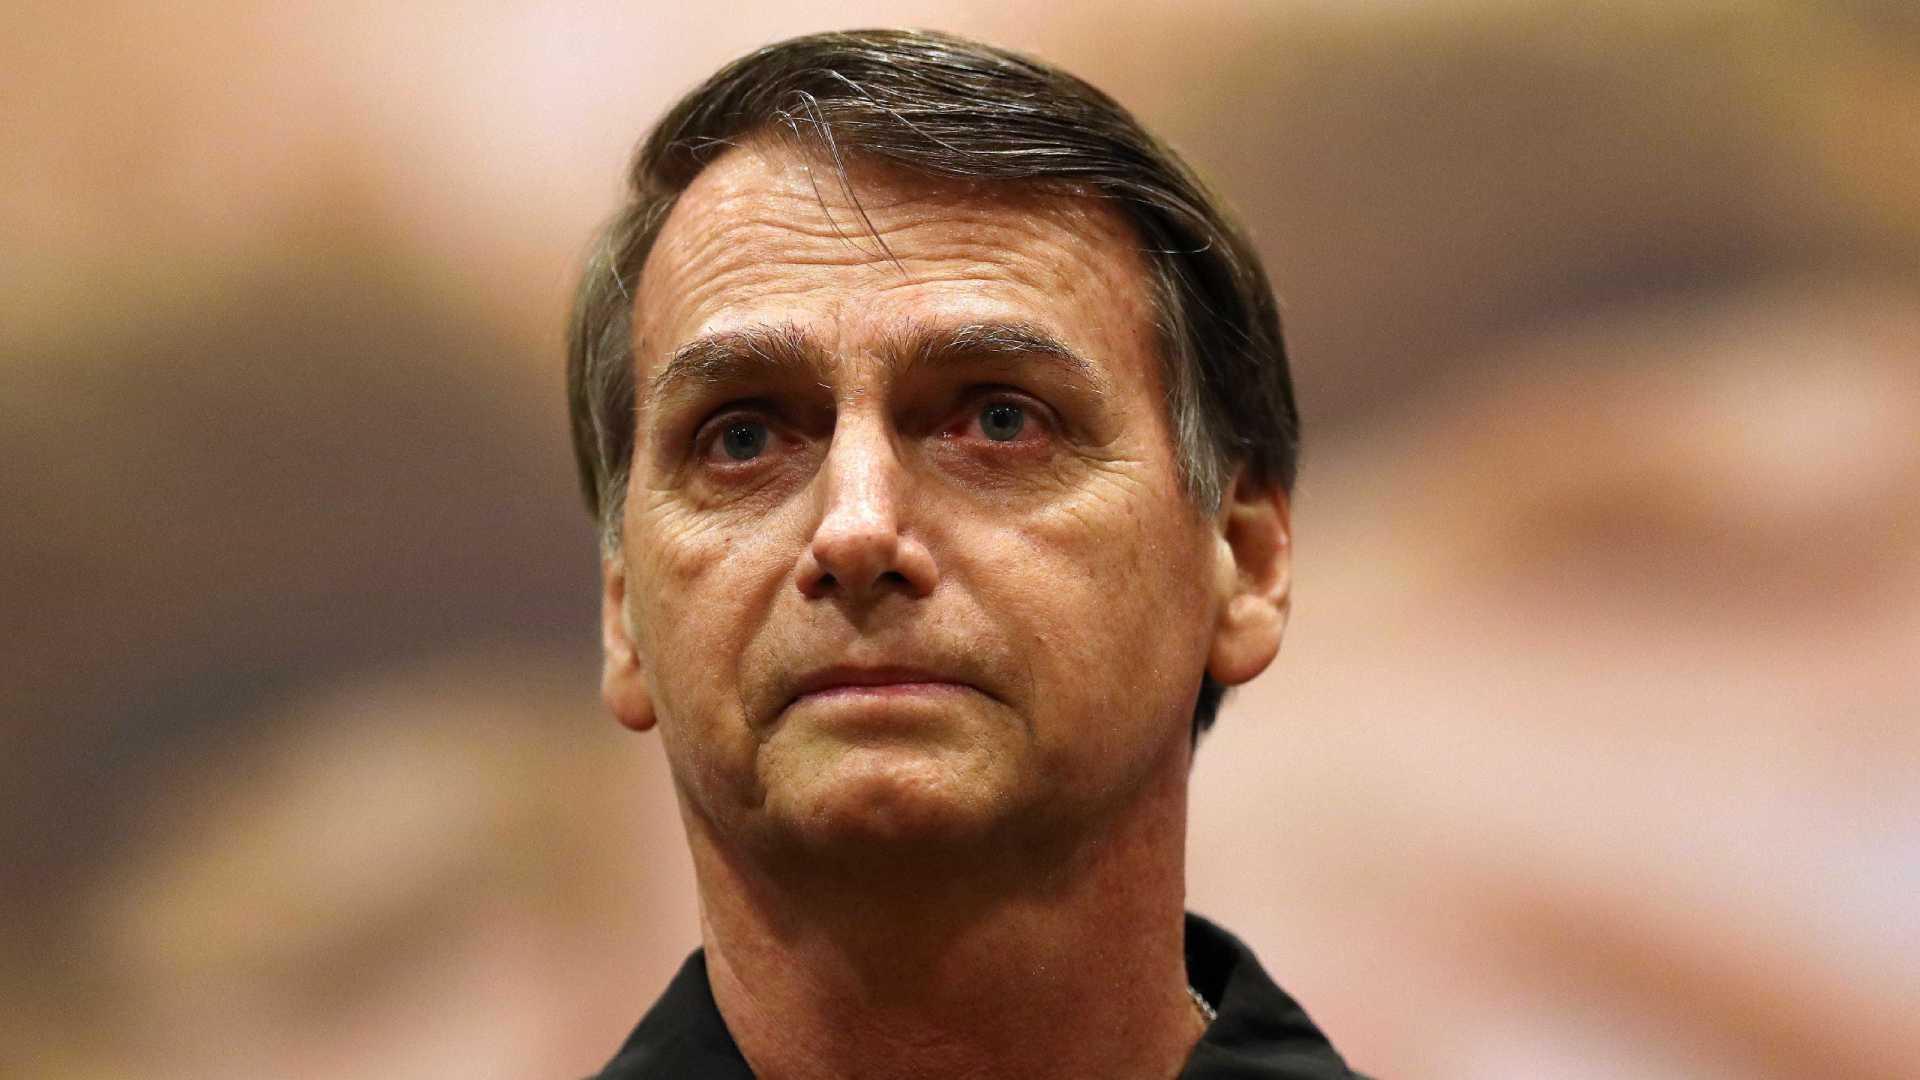 jair bolsonaro - No Twitter, Bolsonaro desautoriza matéria do 'Globo' sobre CPMF